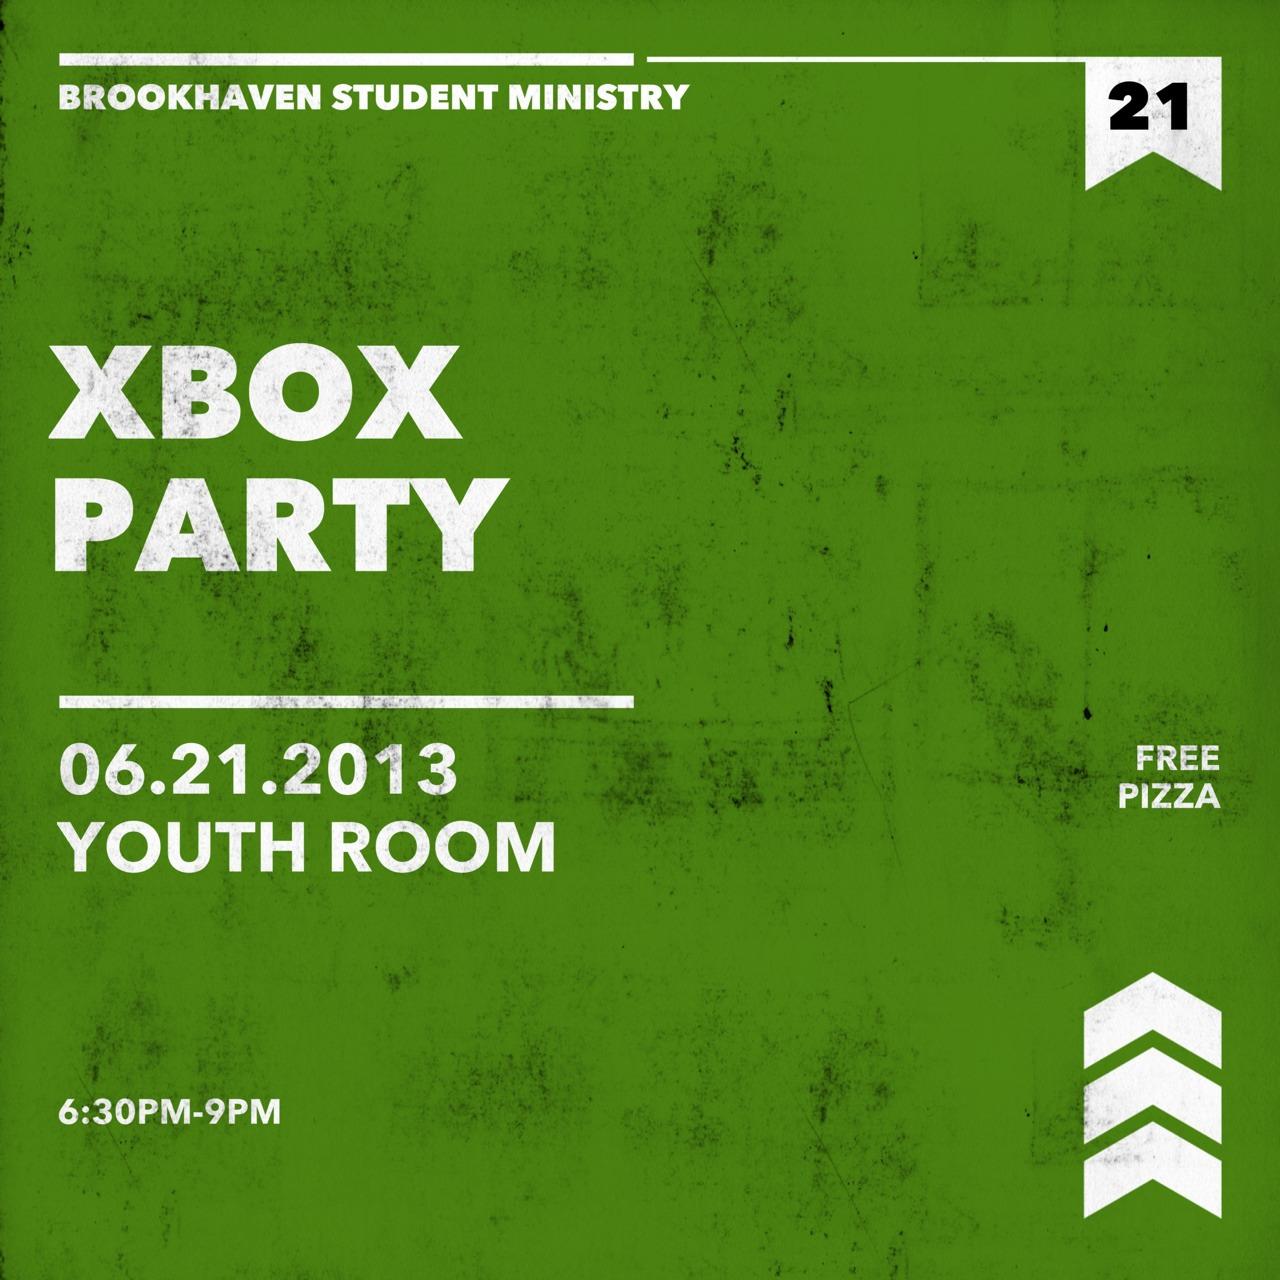 Xbox party Friday night!